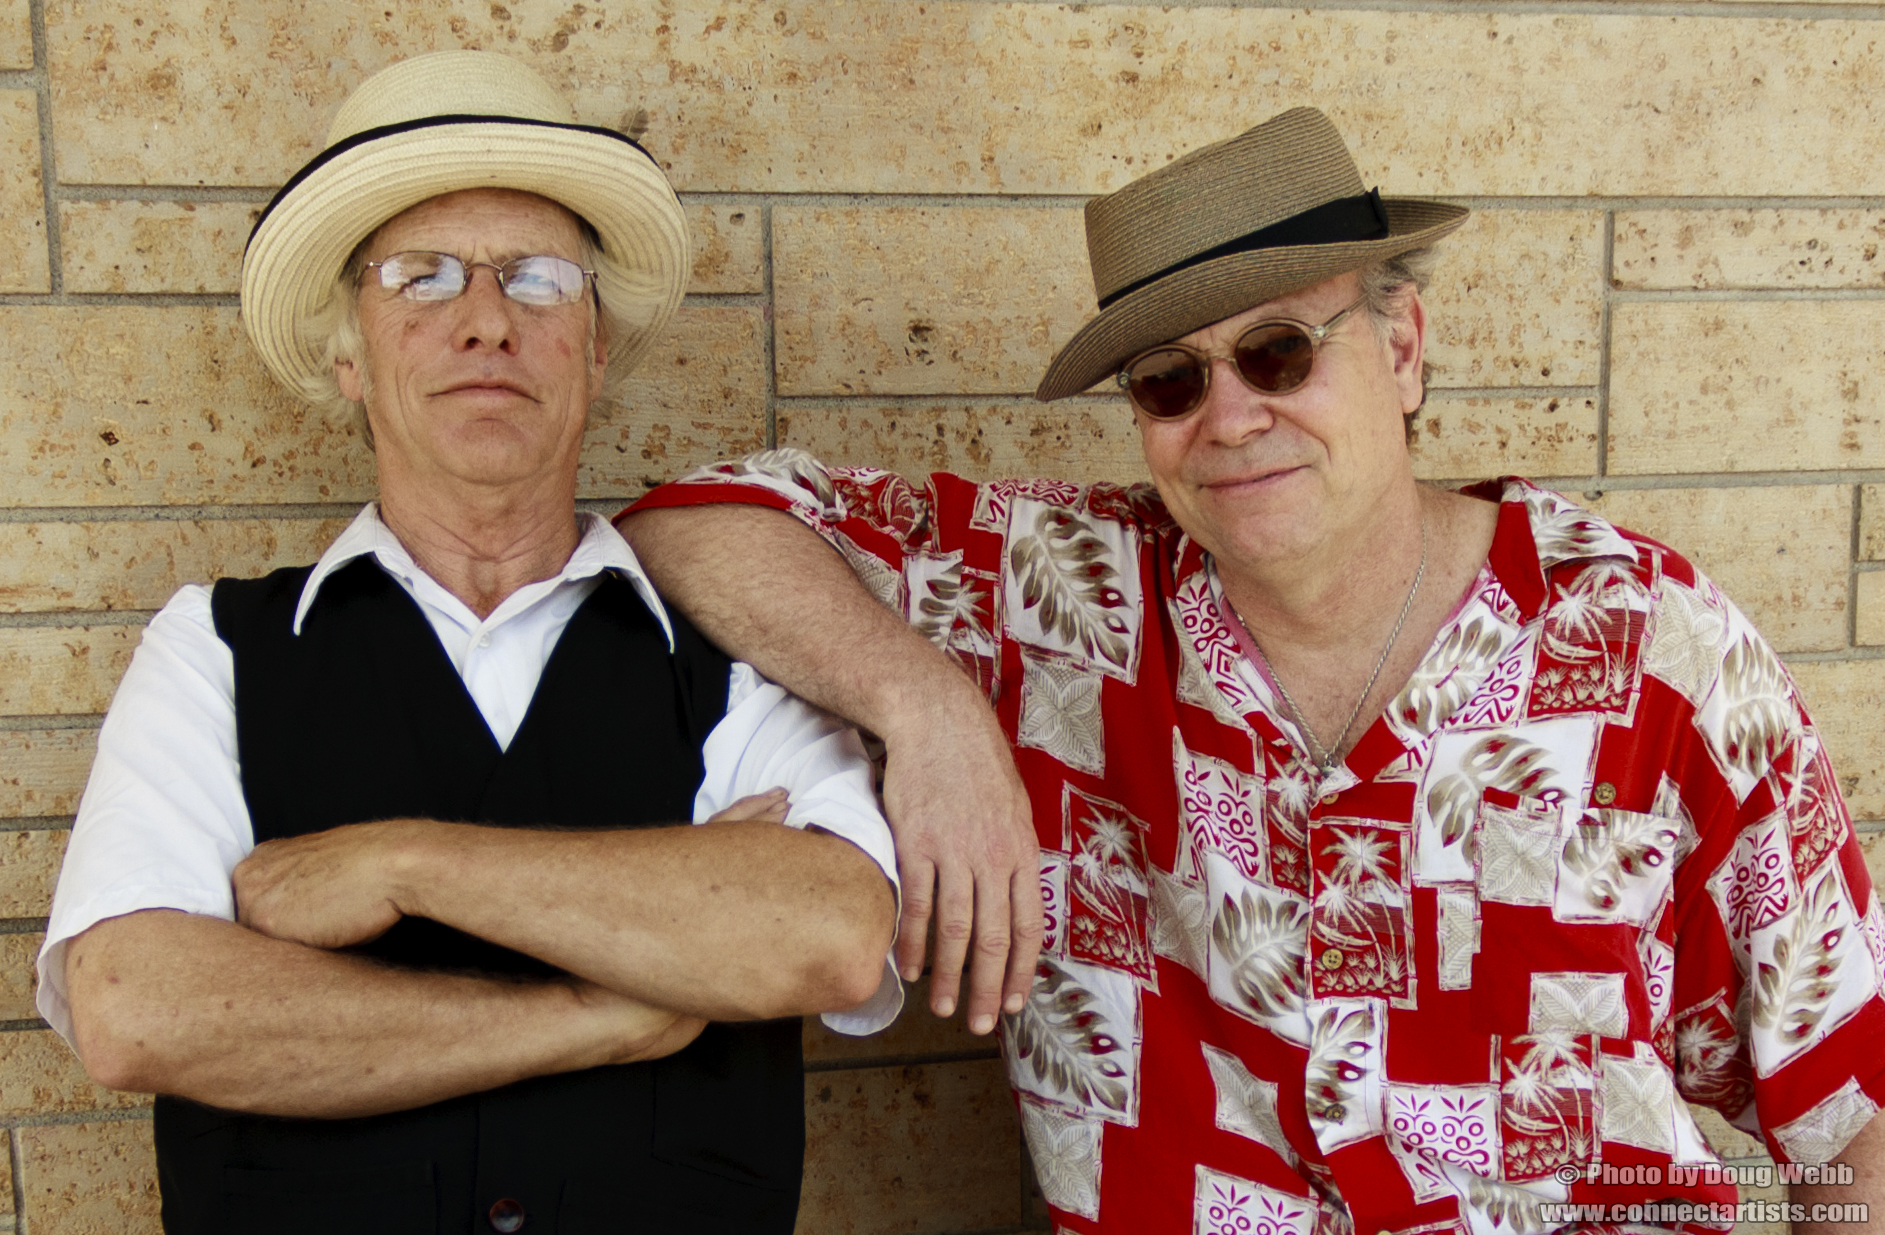 Buds - Danny Lord & Lloyd Brant | Open Streets Minneapolis | June 10, 2012 |